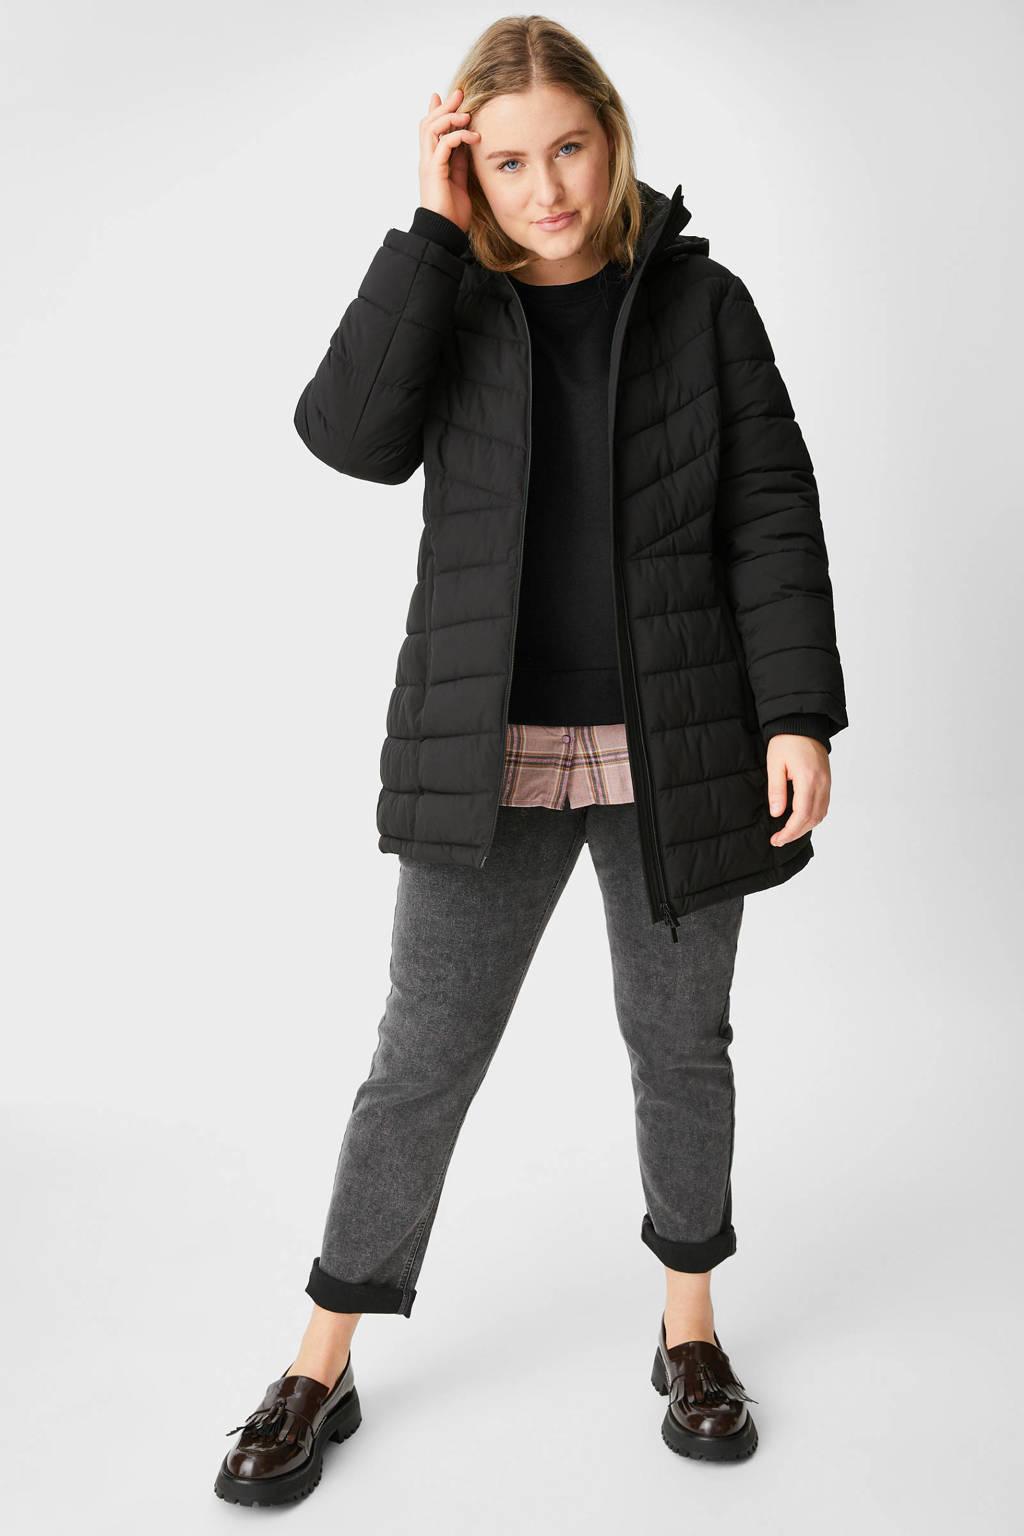 C&A XL Yessica sweater met bijpassende blouseverlening zwart/lichtroze/oranje, Zwart/lichtroze/oranje